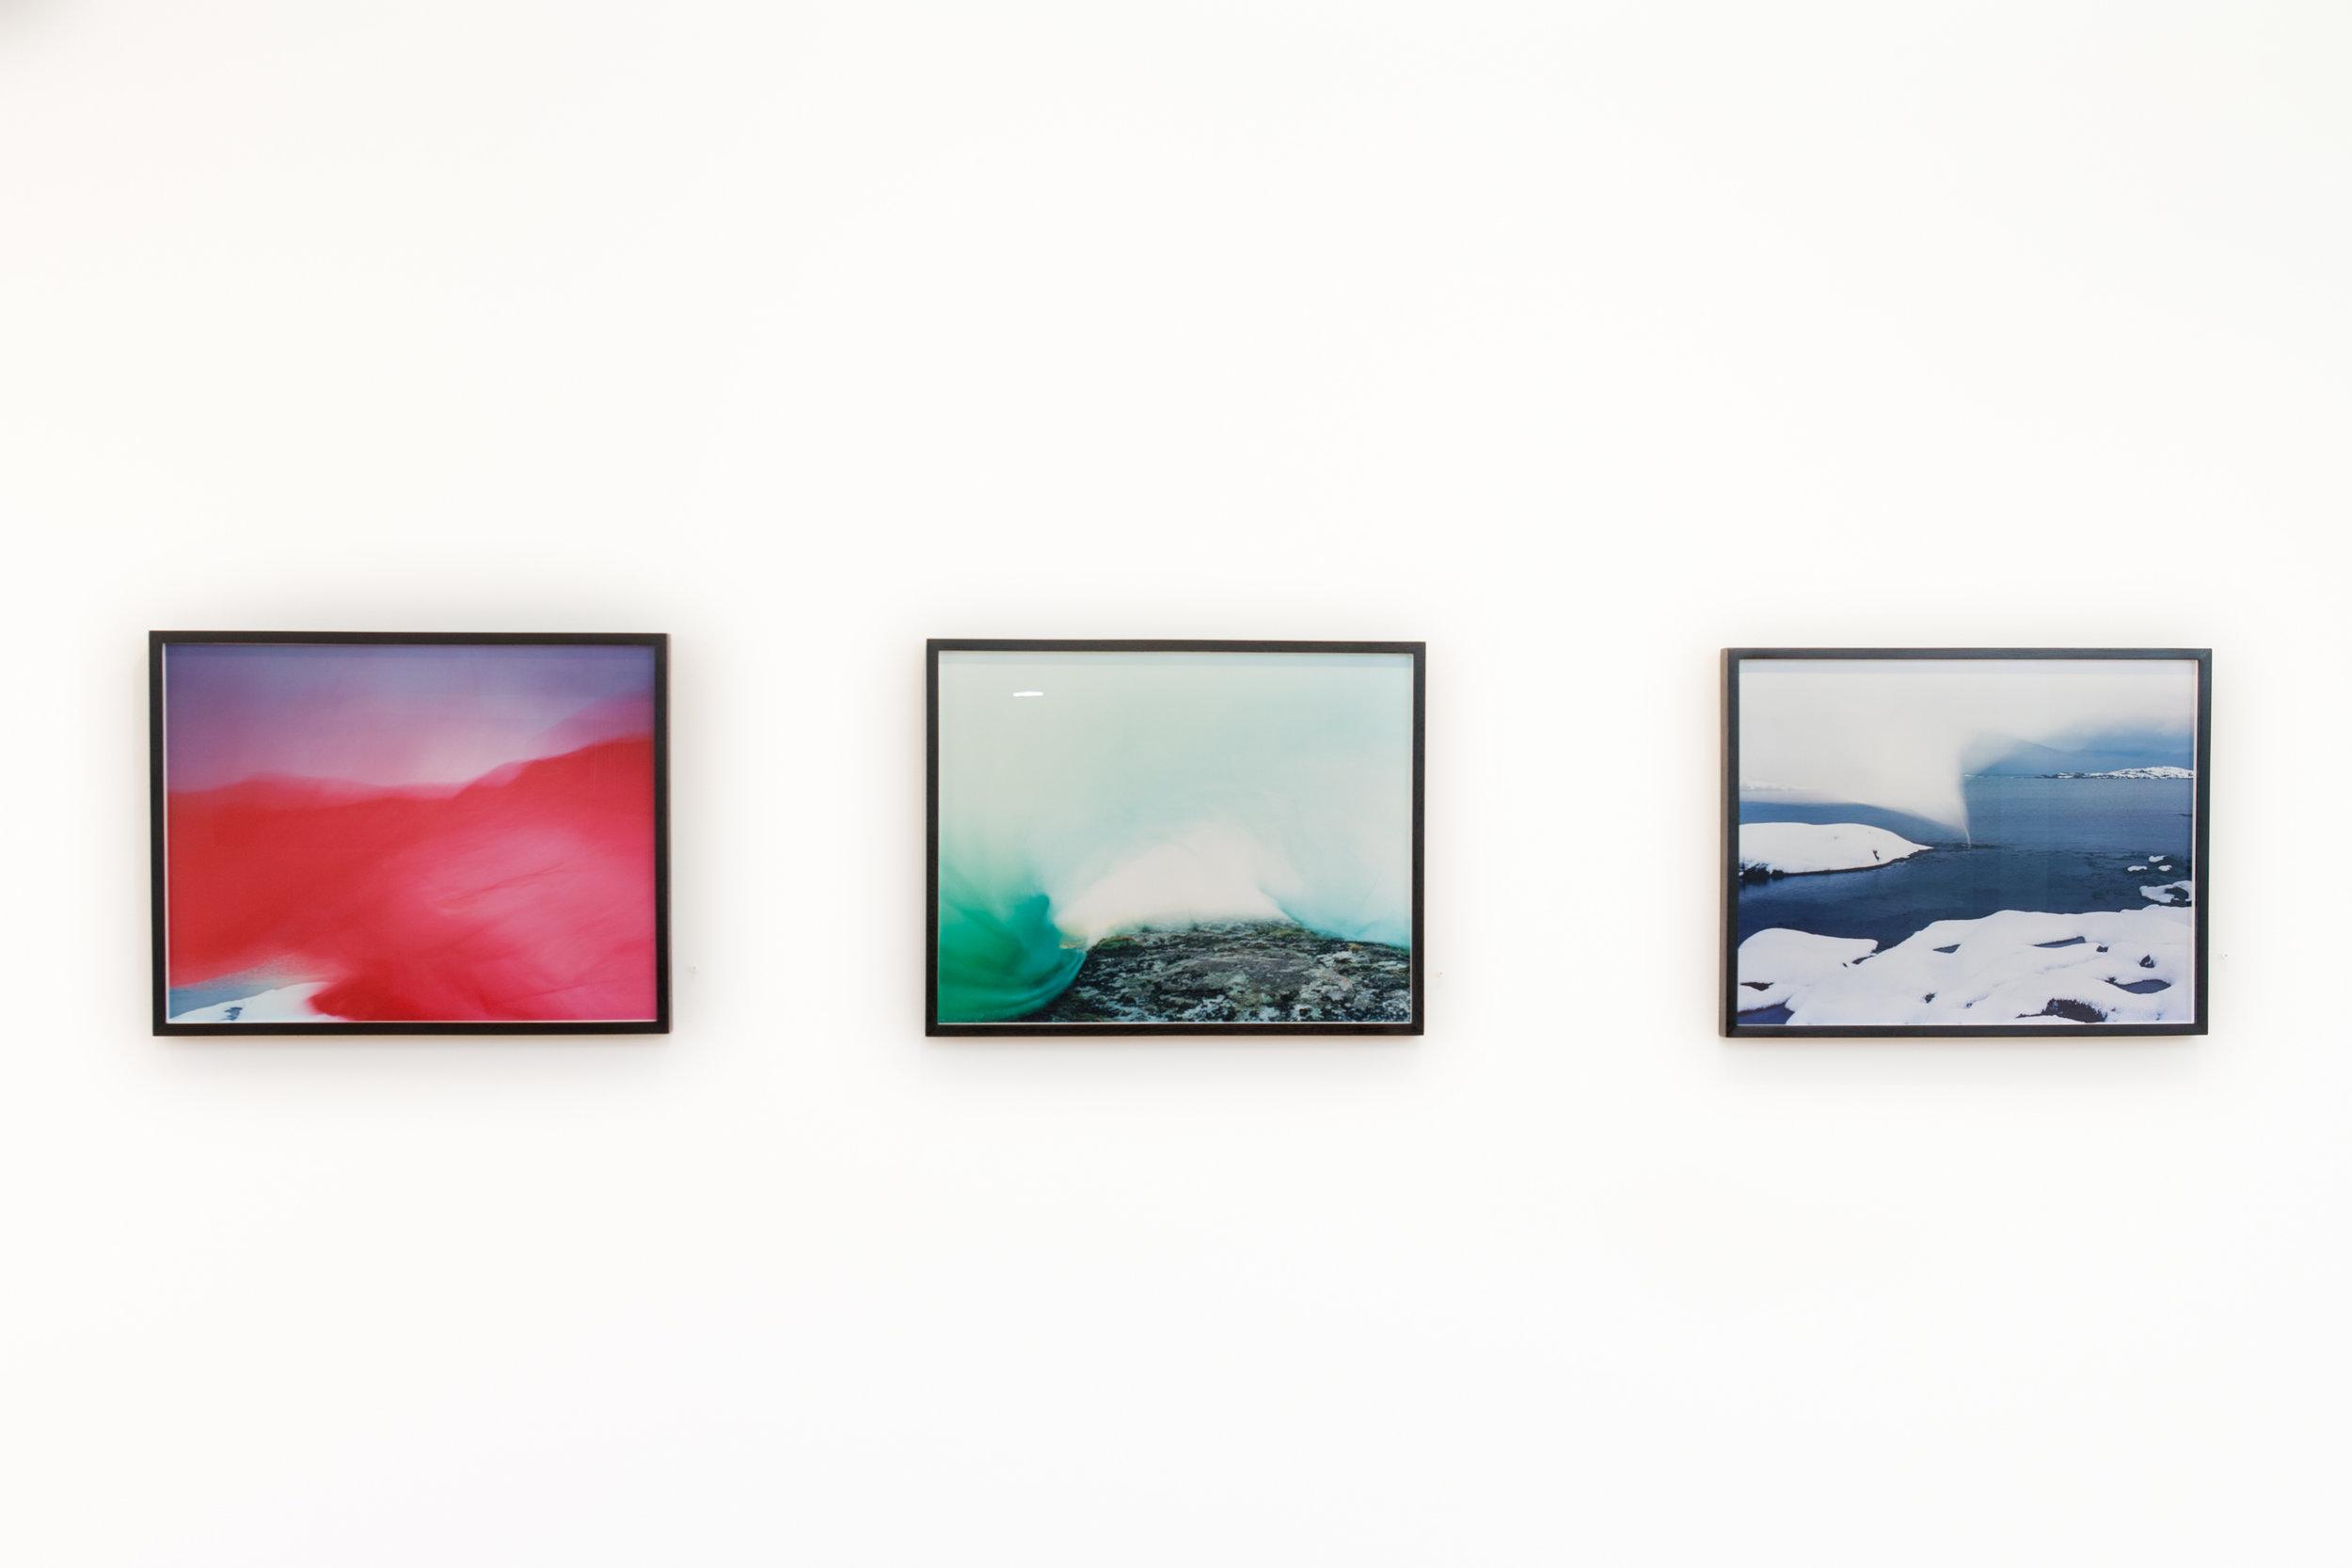 Installation view from  Dedee Shattuck Gallery, Westport, MA  All analog C-prints